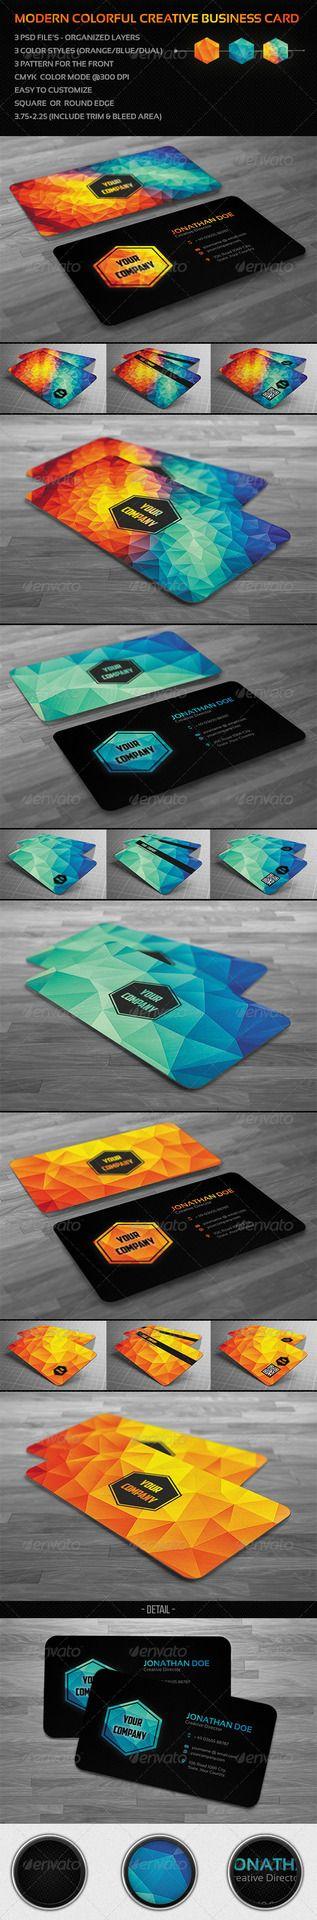 Link: http://graphicriver.net/item/creative-modern-polygon-business-card-/8005986